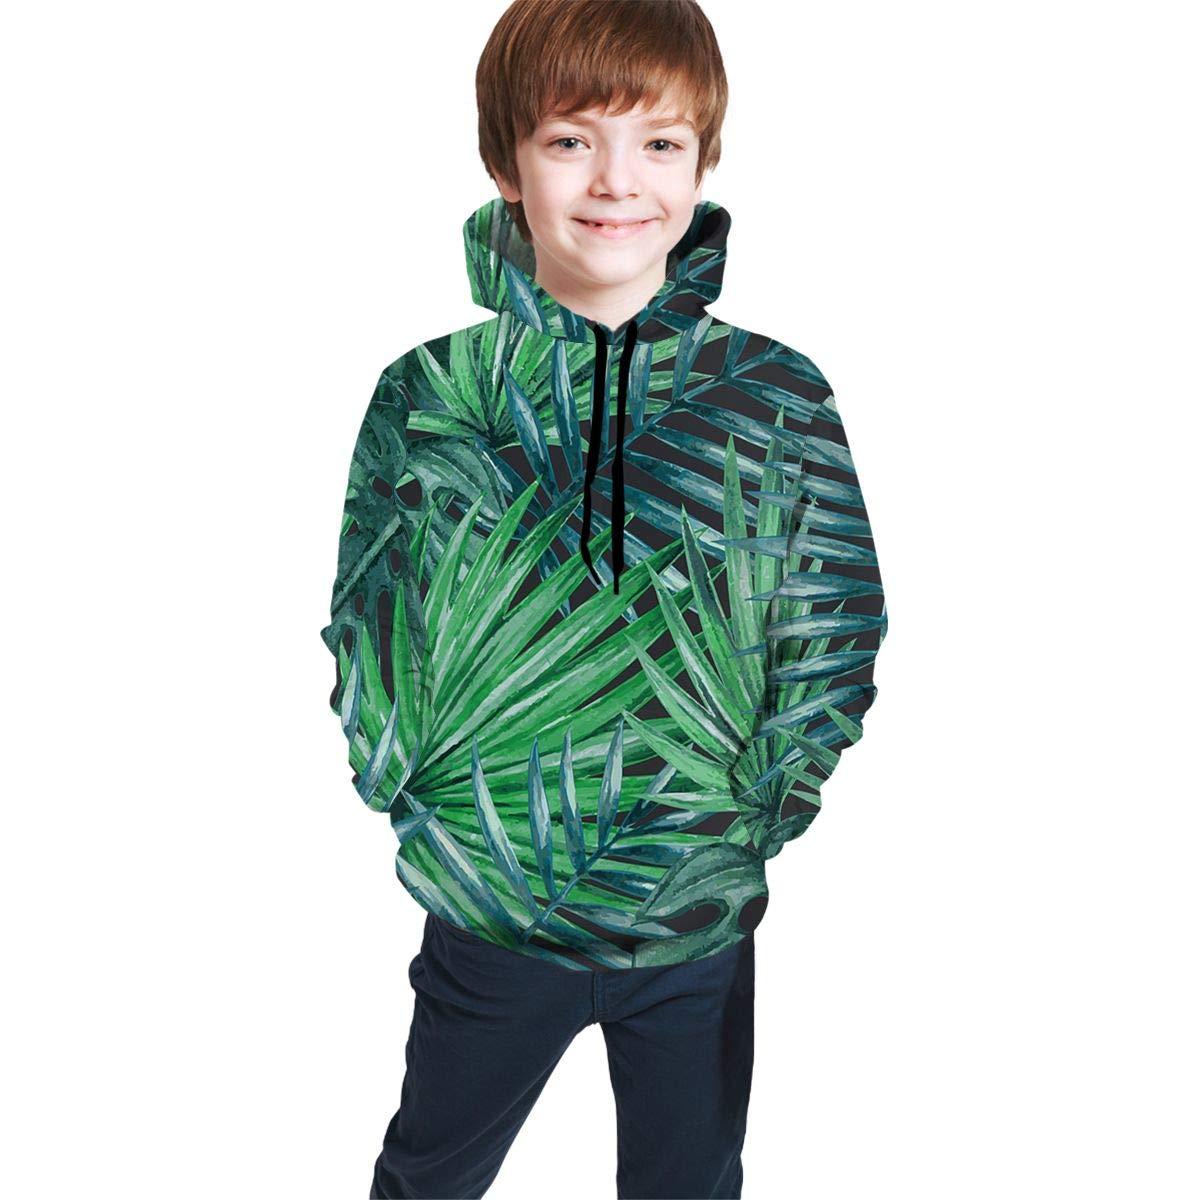 Youth 3D Print Art Green Leaf Maple Hooded Sweatshirt